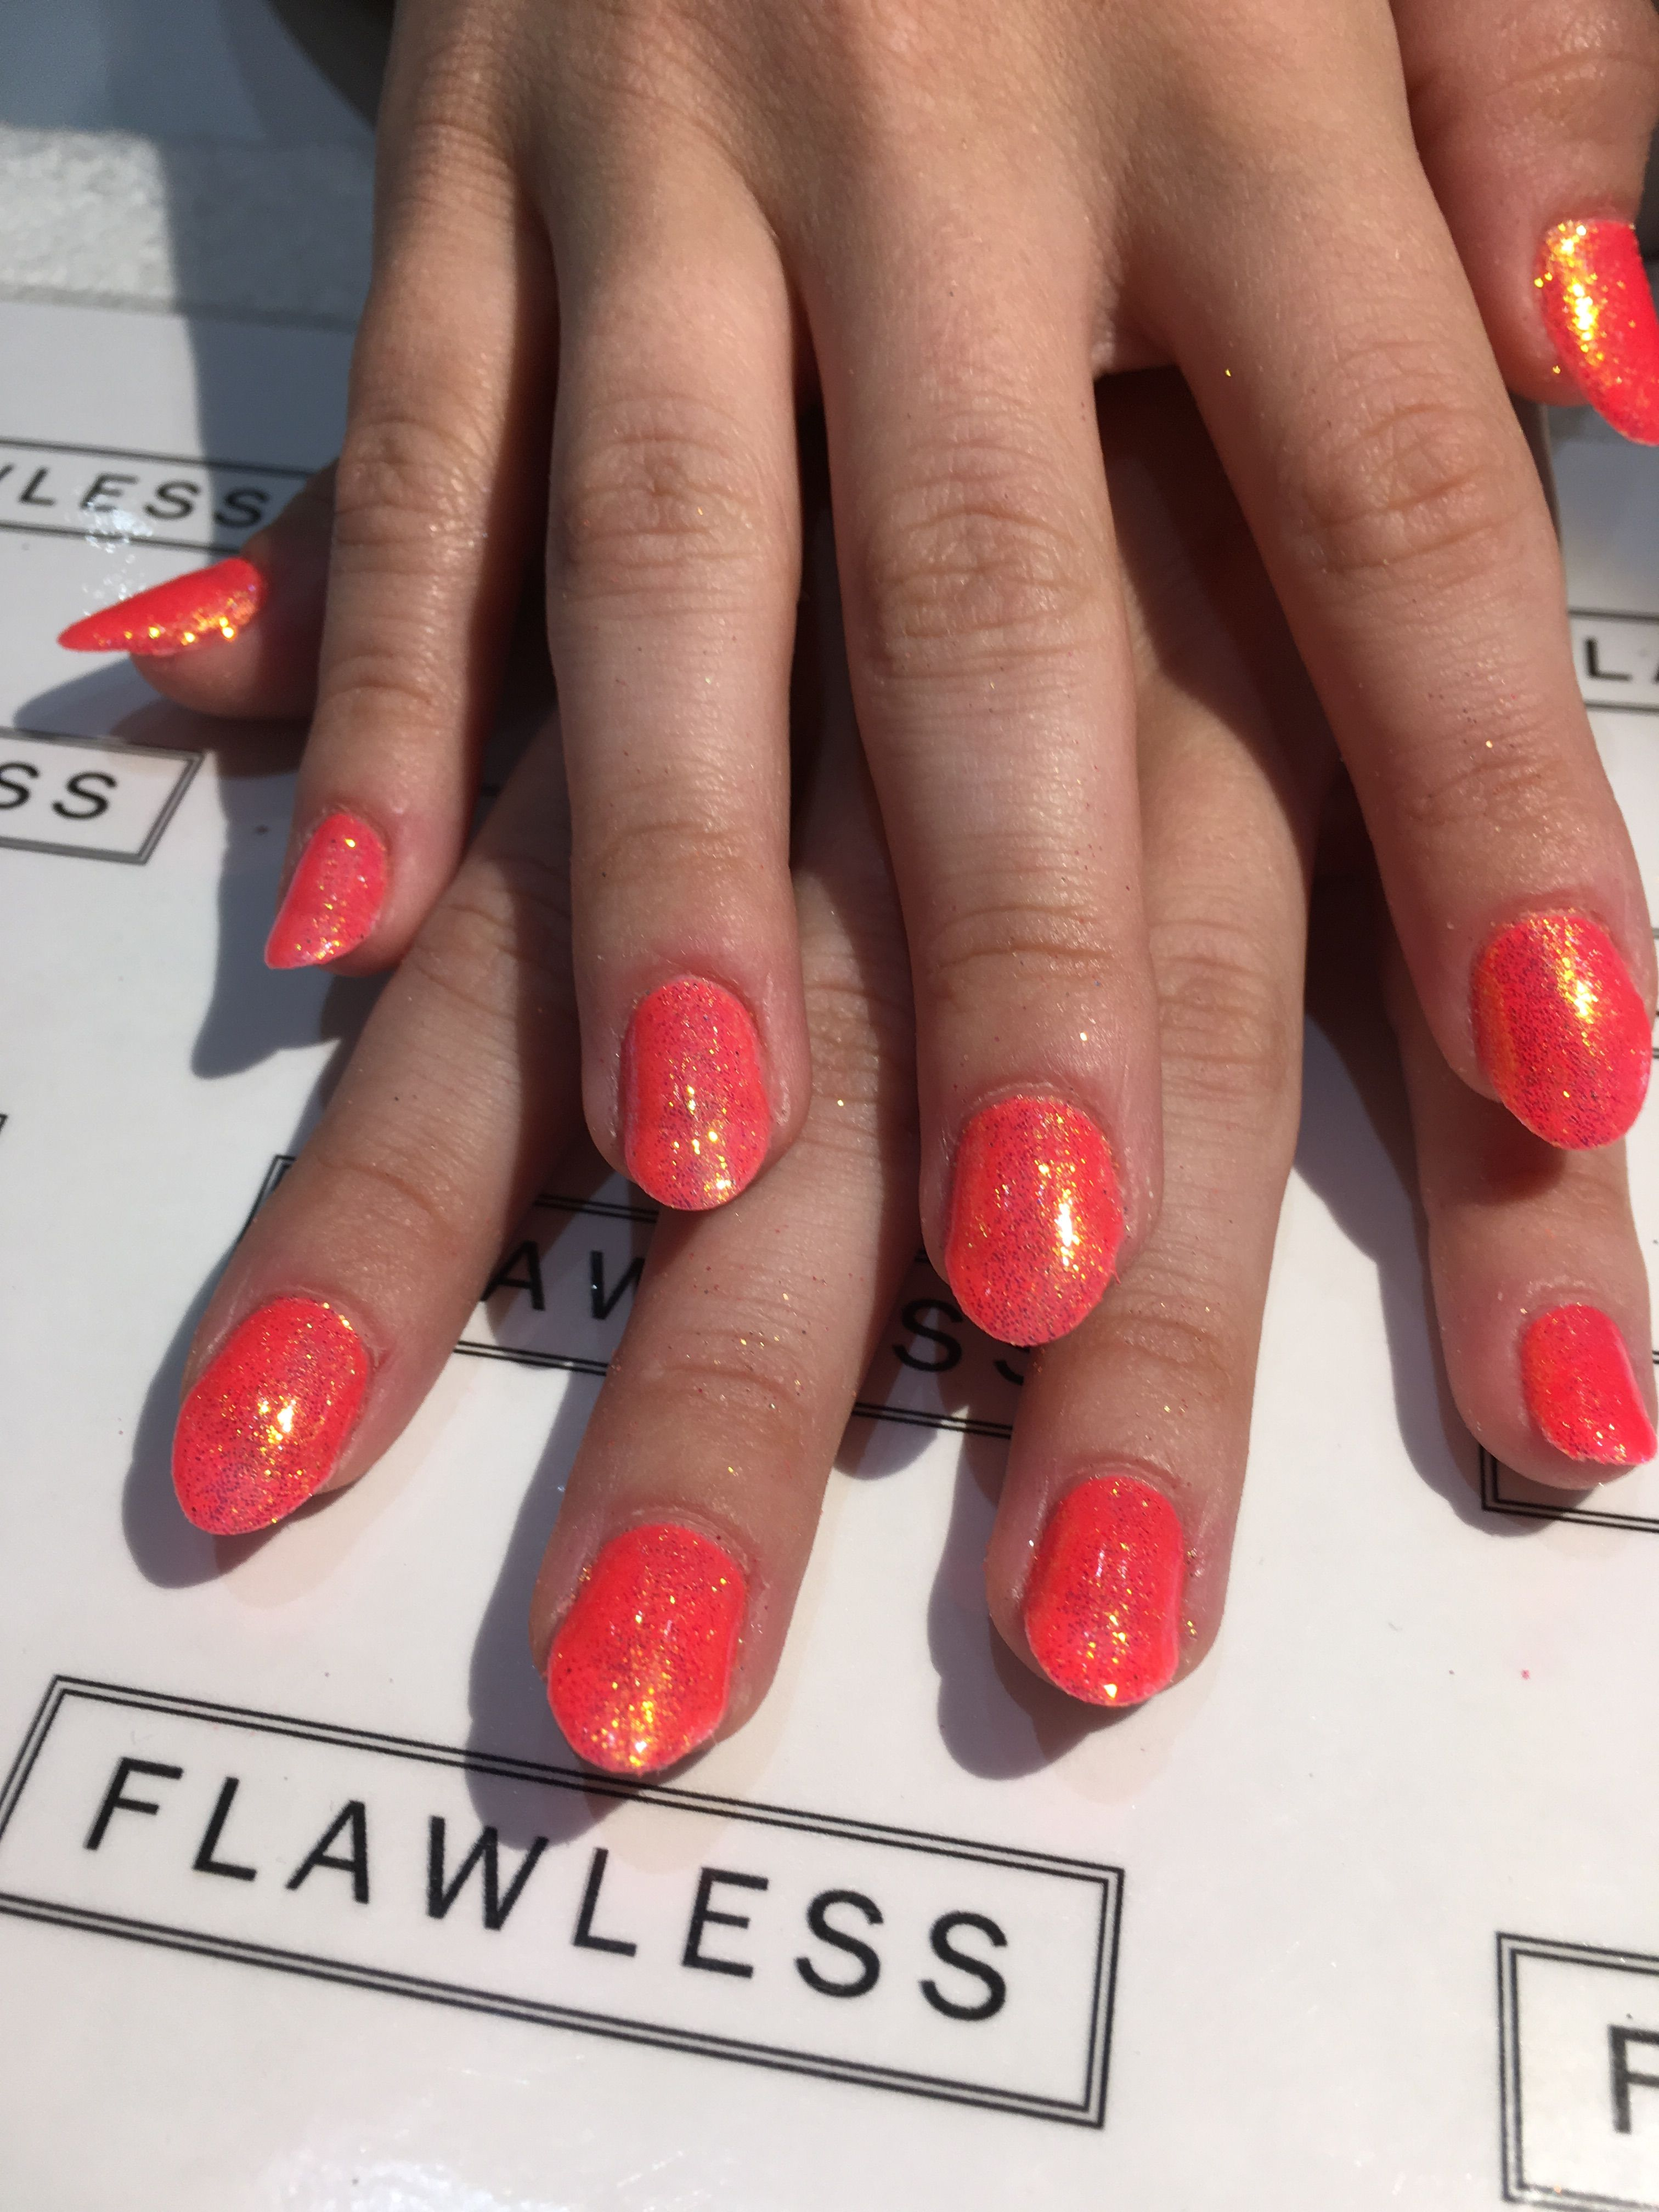 Neon summer Gelish nails at Flawless   Hair and beauty ...